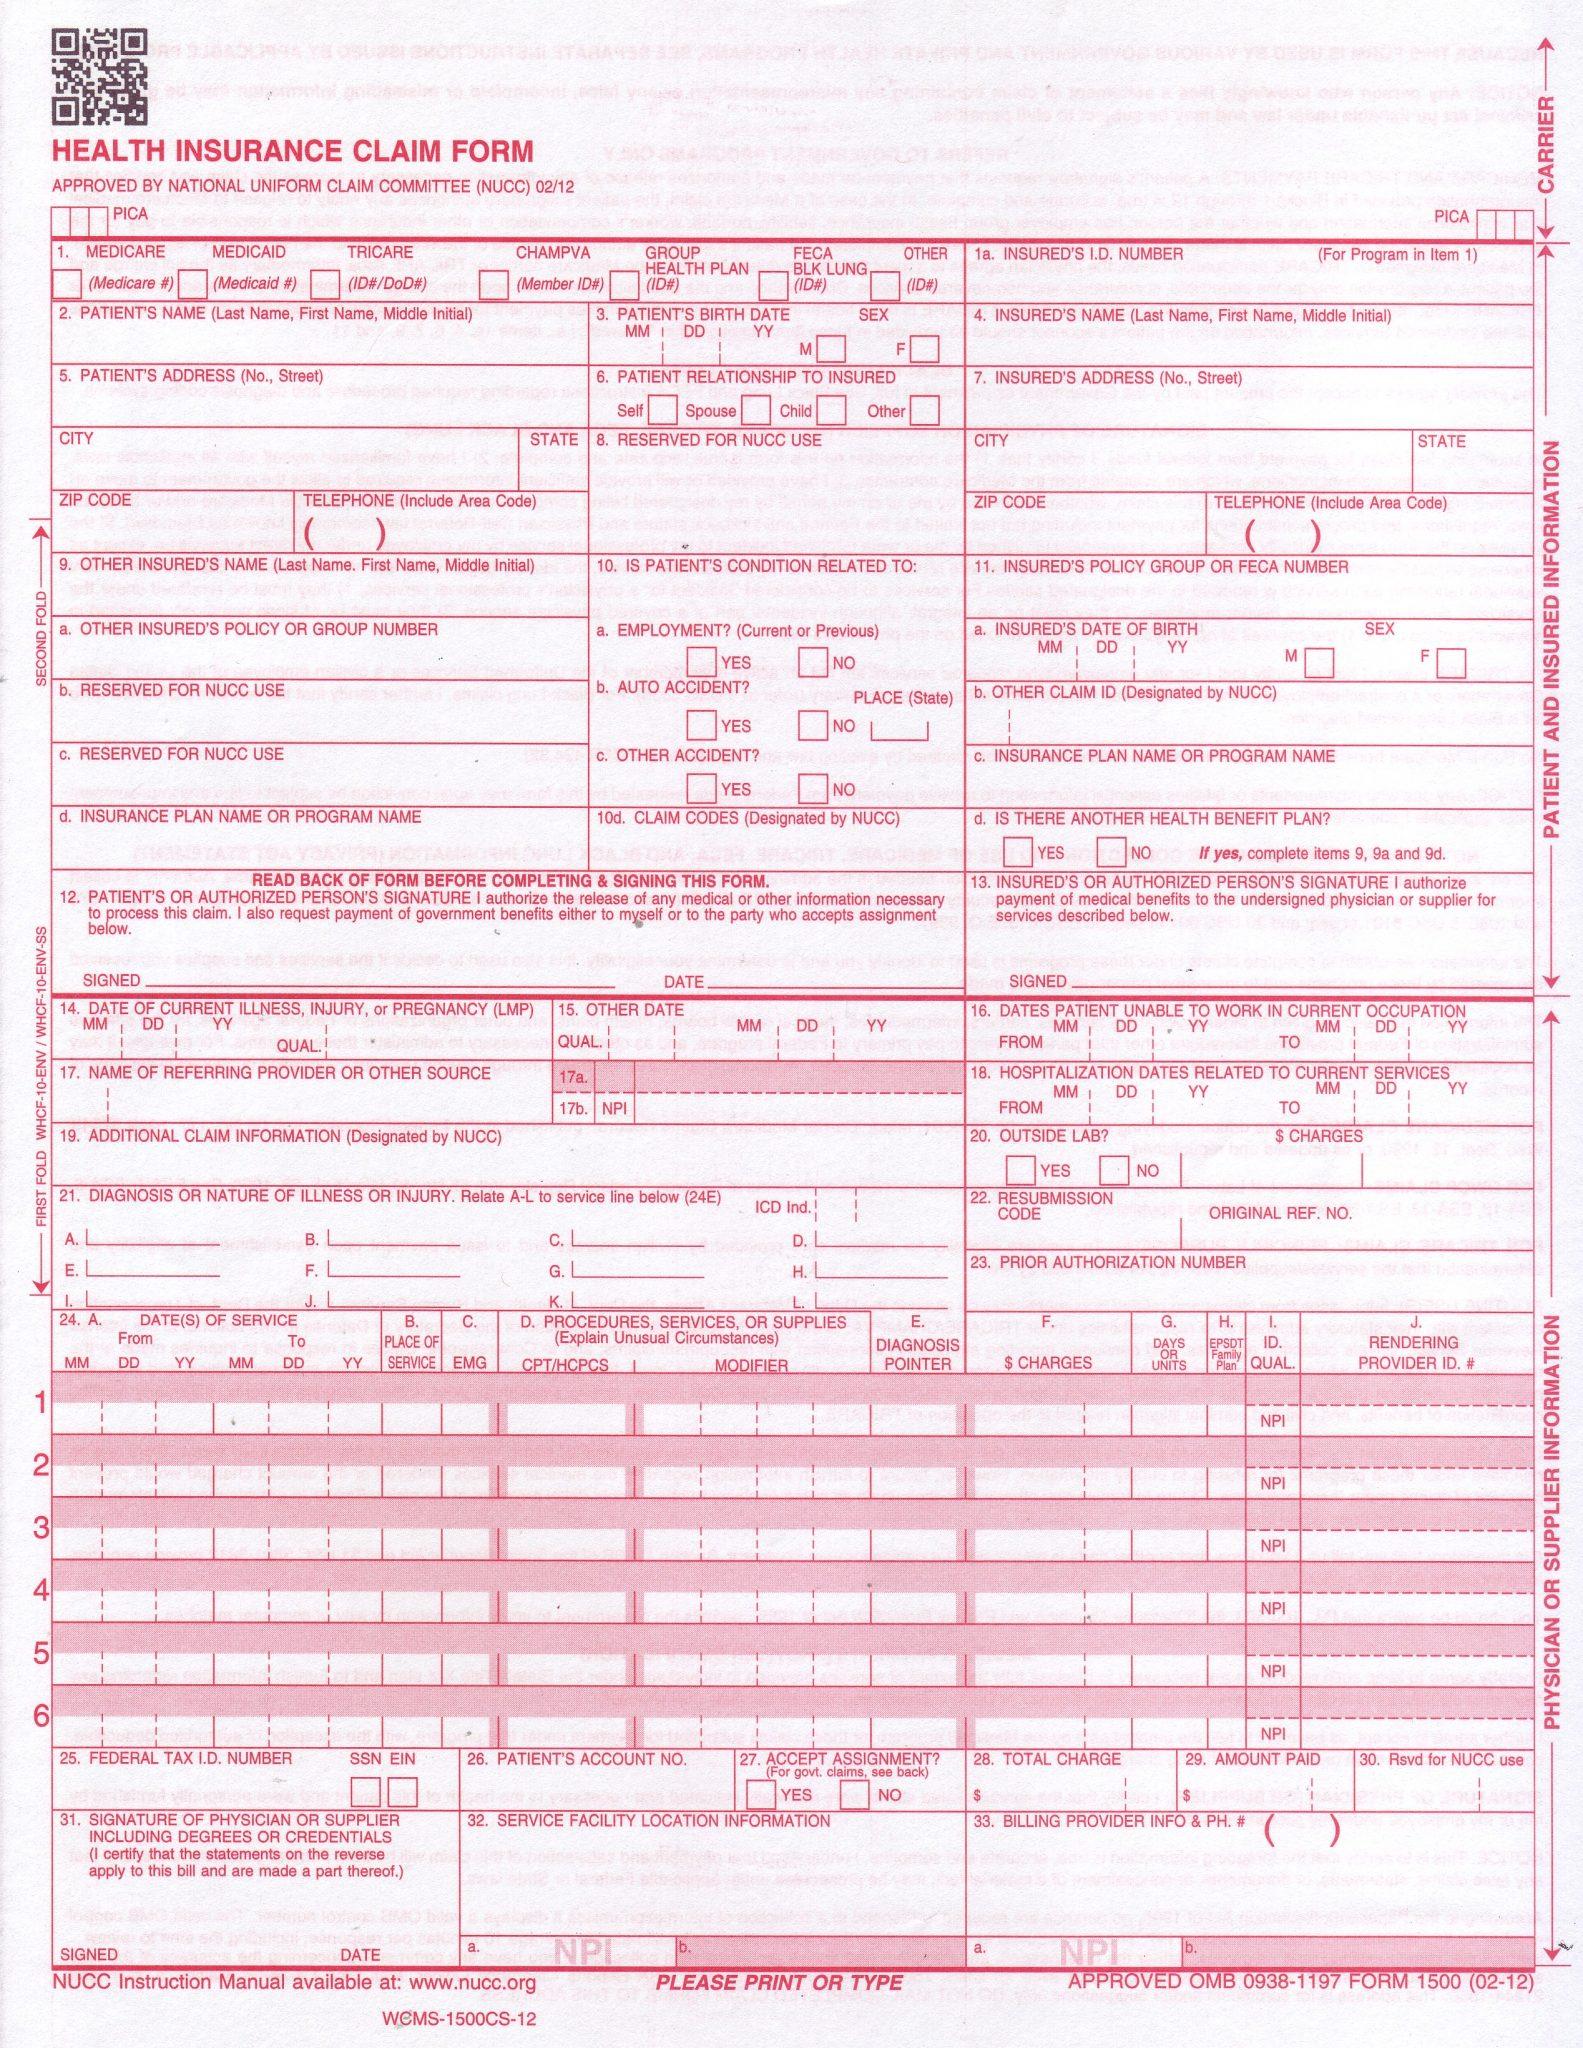 Mental Health CMS1500 Form Download JPG + PDF